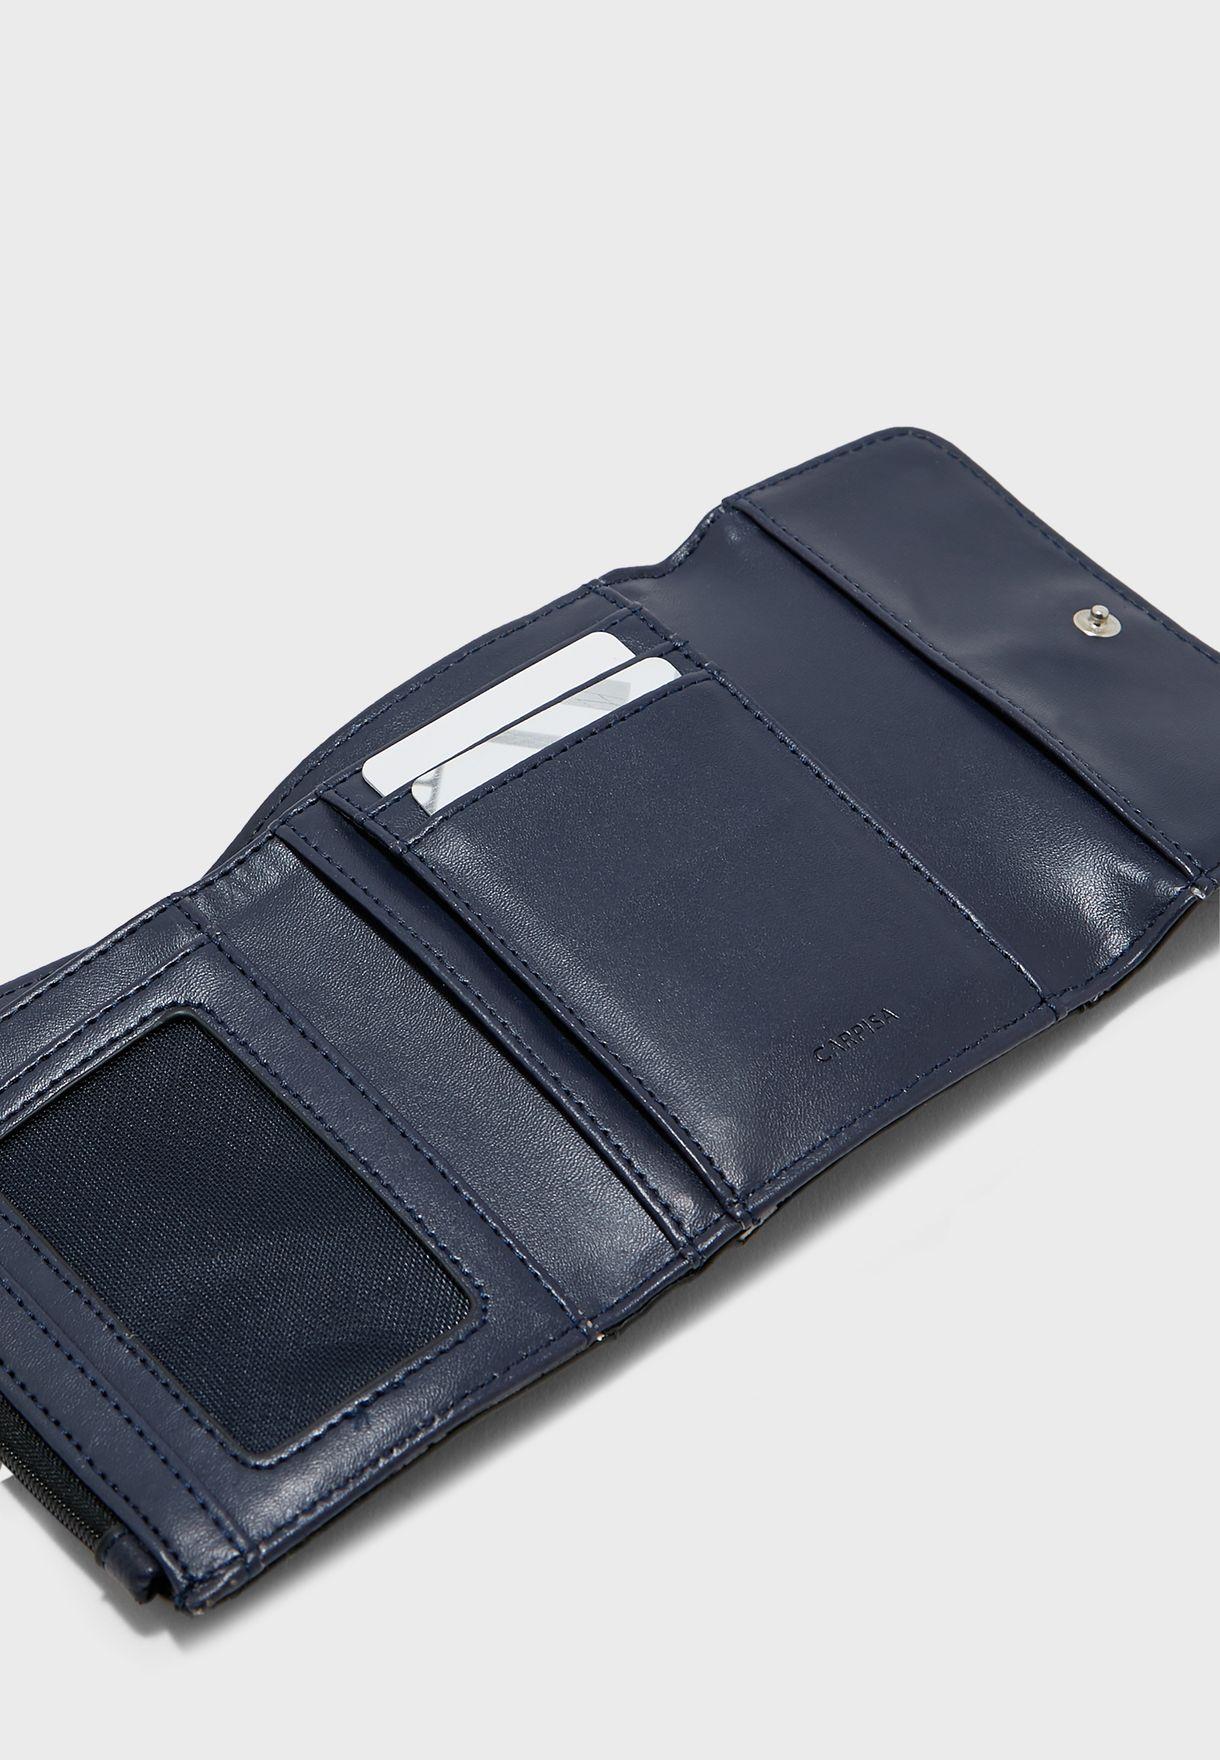 Trifold Multi Pocket Purse